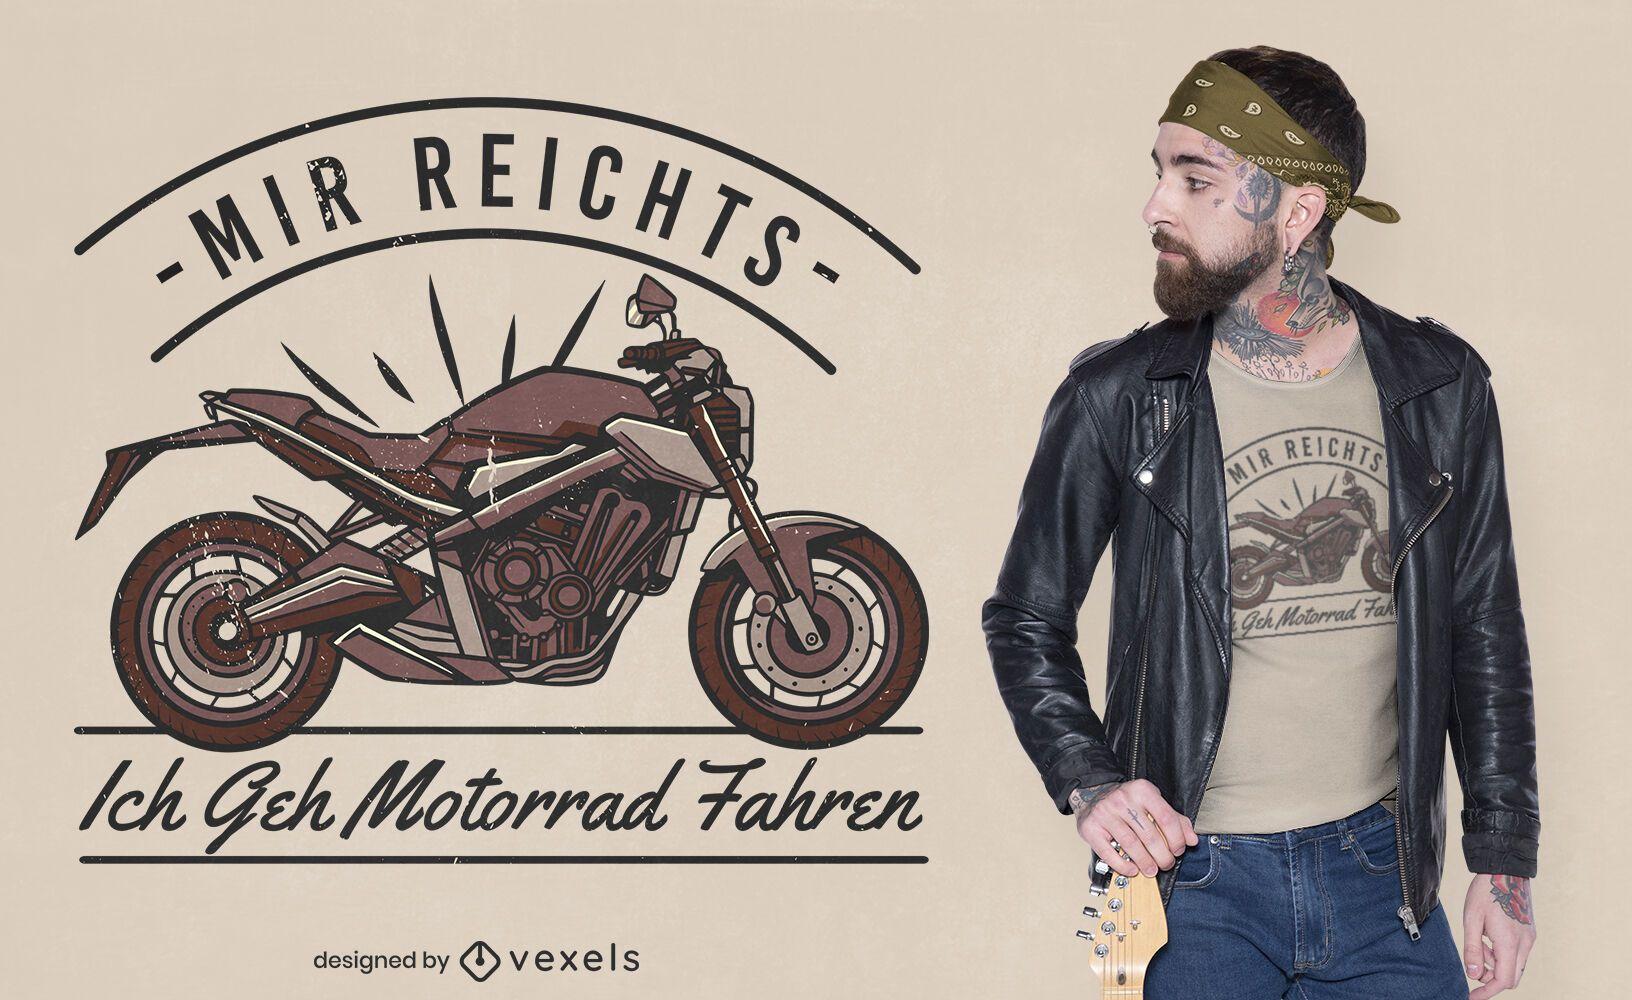 Diseño de camiseta de paseo en motocicleta vintage.